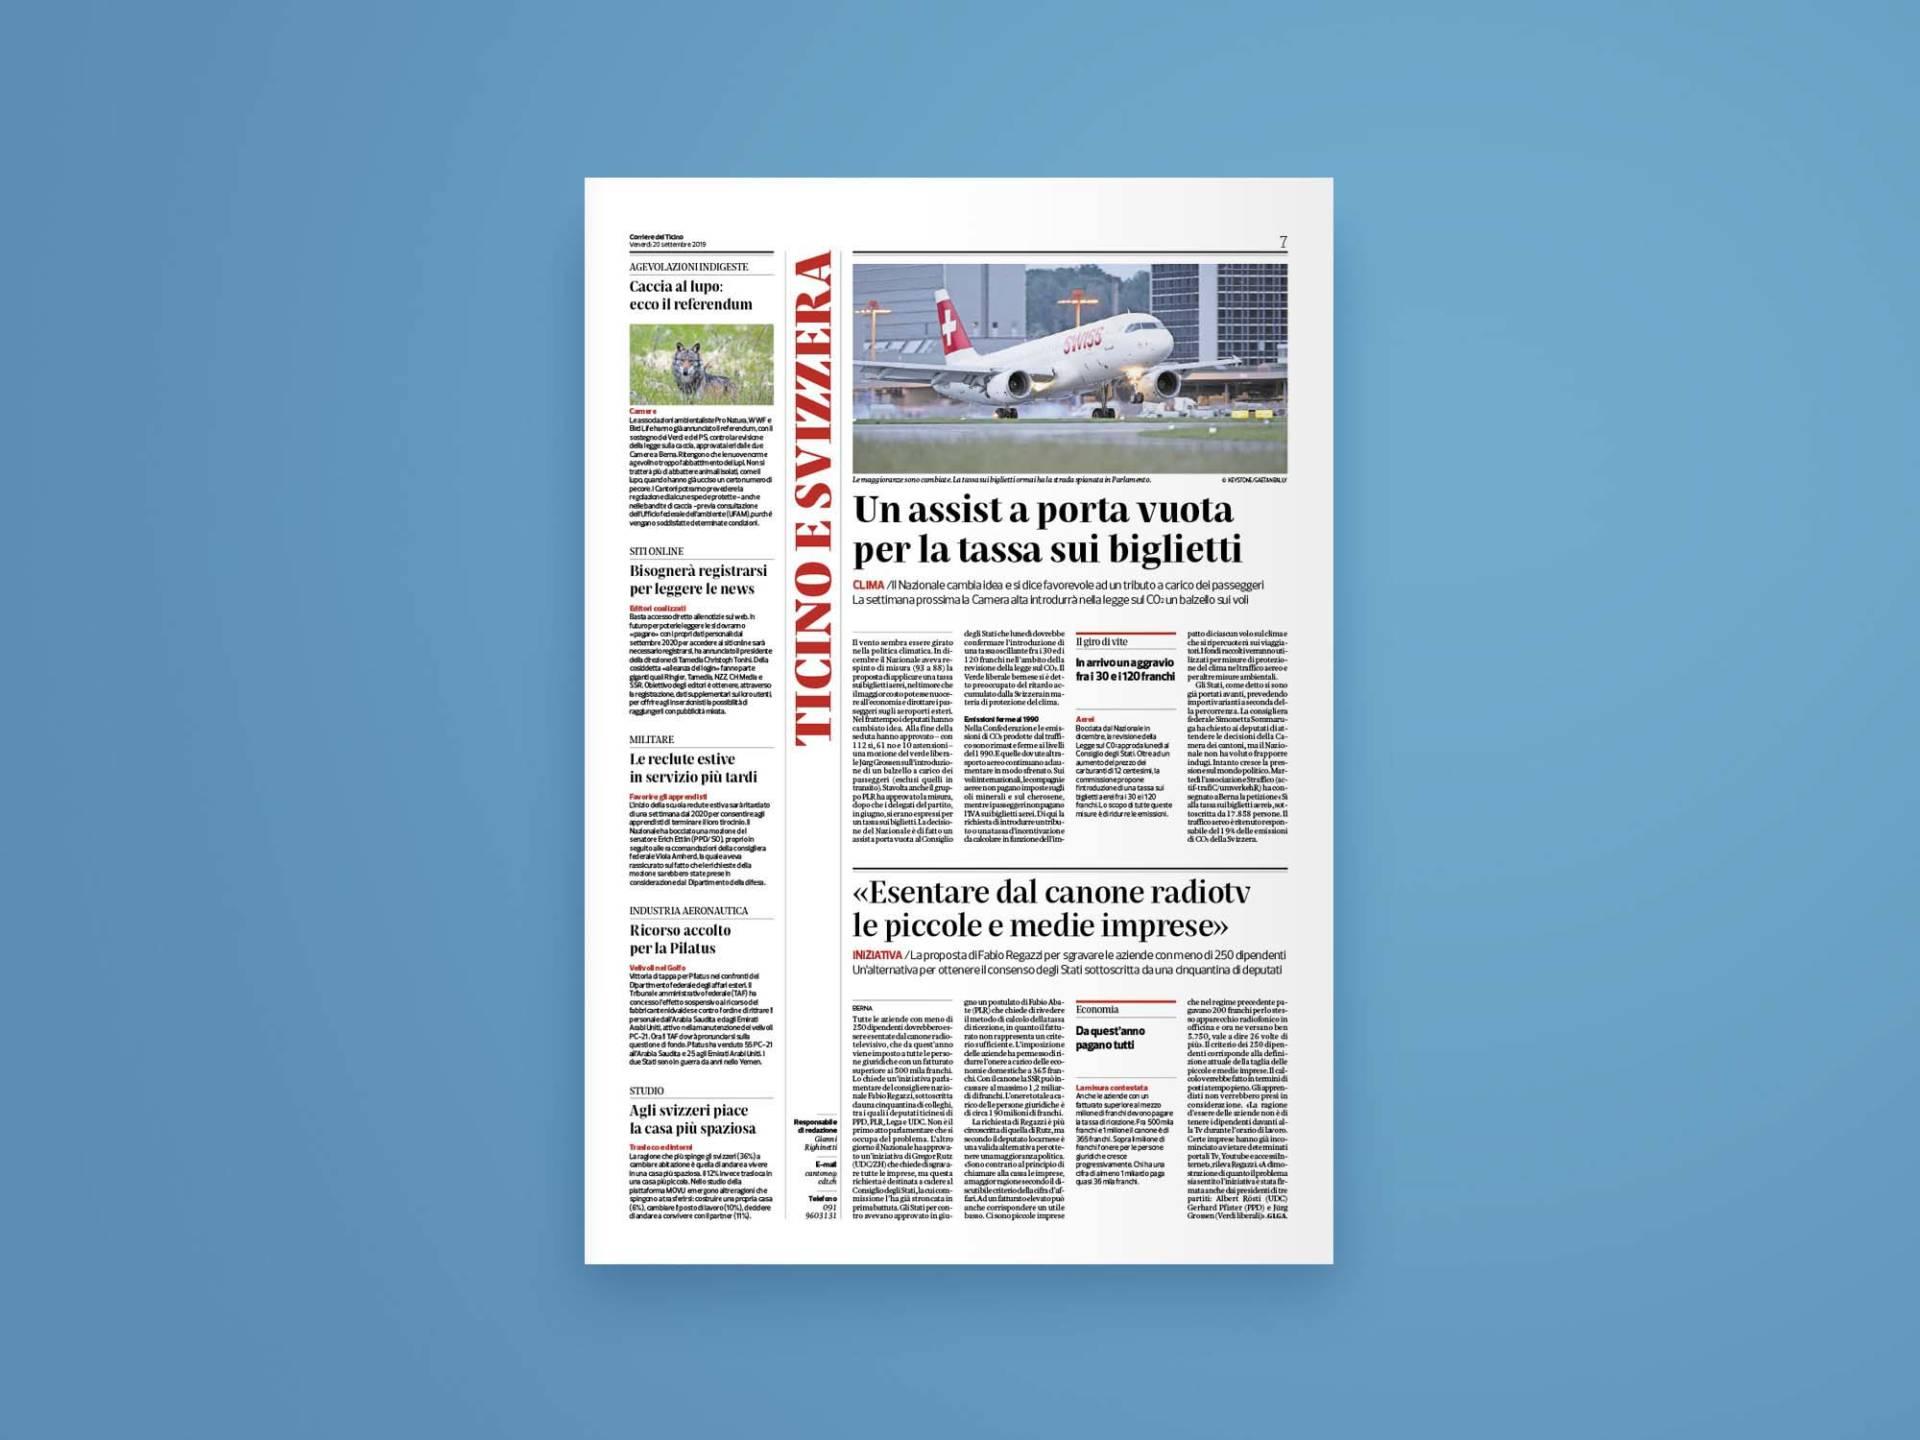 Corriere_Del_Ticino_04_Wenceslau_News_Design